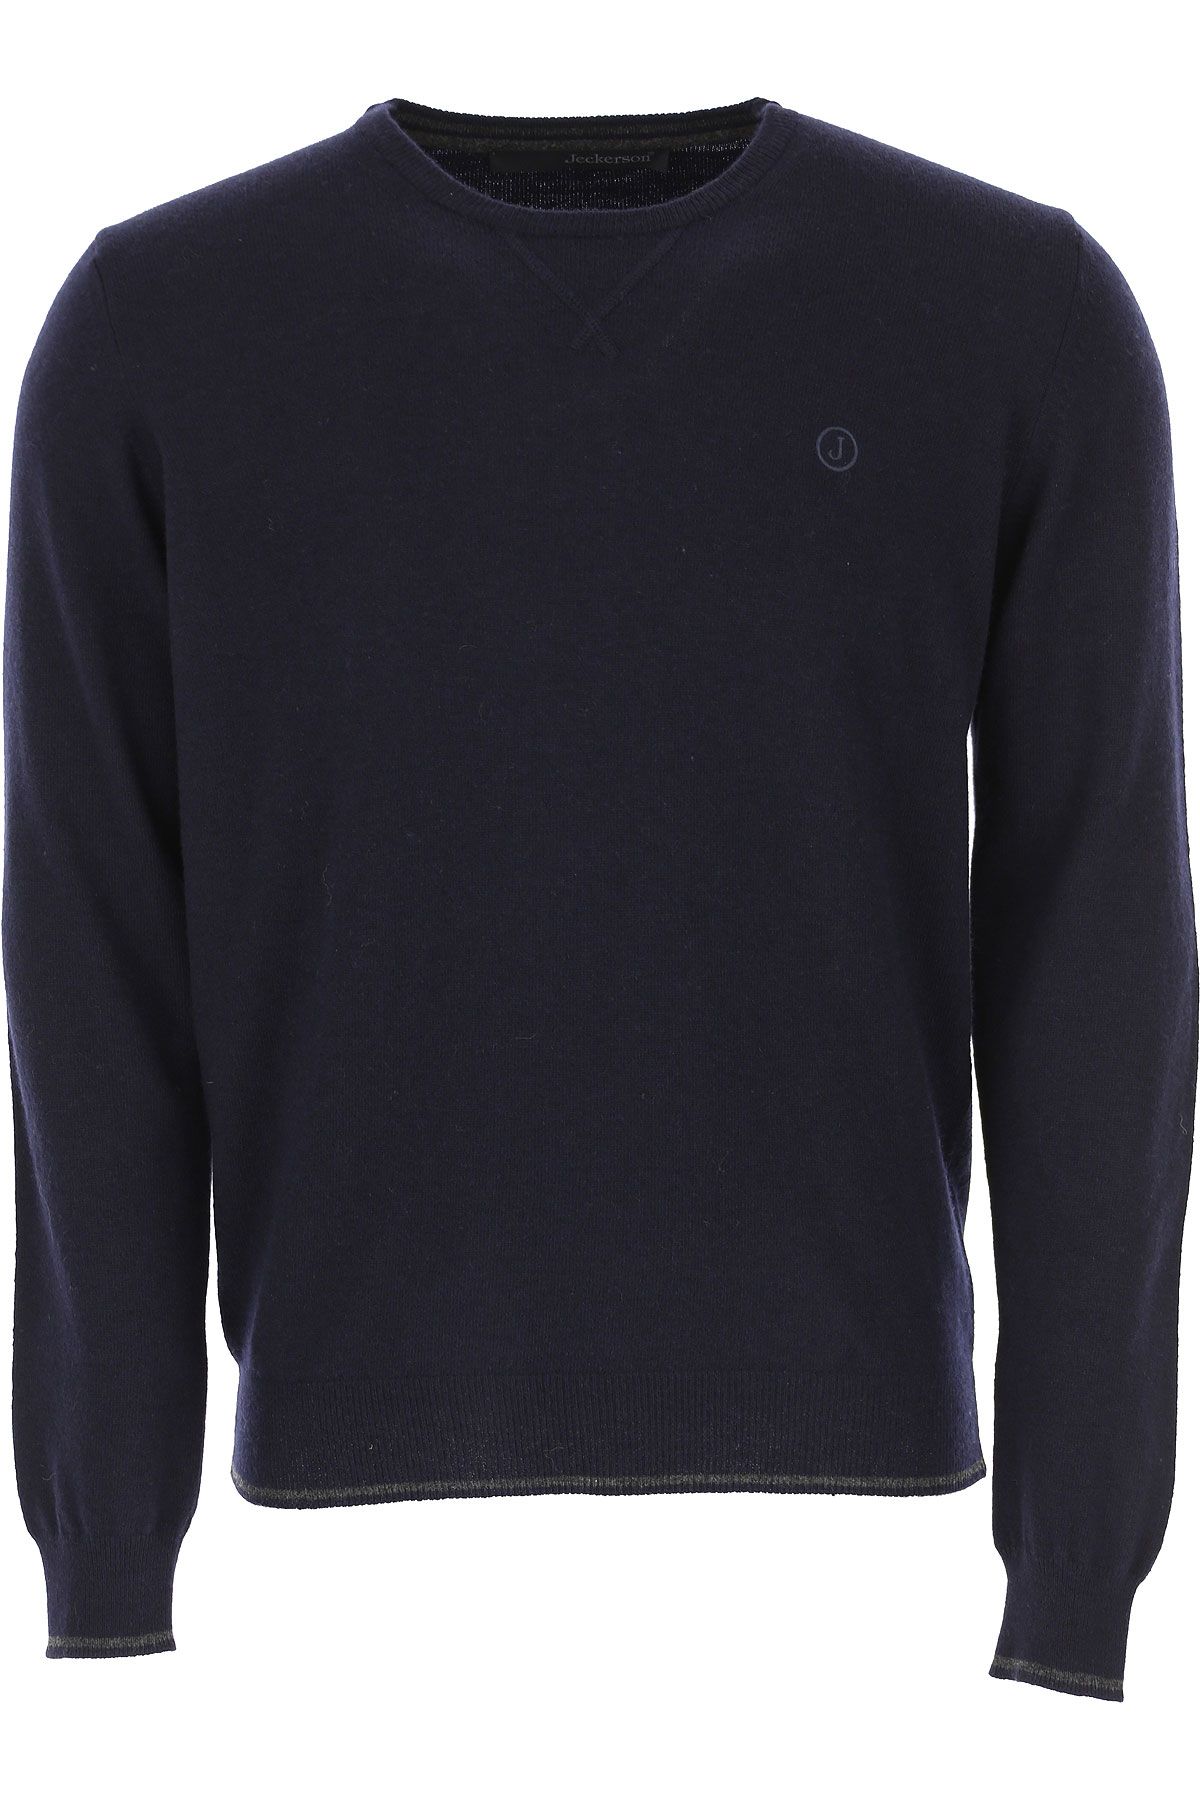 Jeckerson Sweater for Men Jumper On Sale, Blue, polyamide, 2019, L XXL